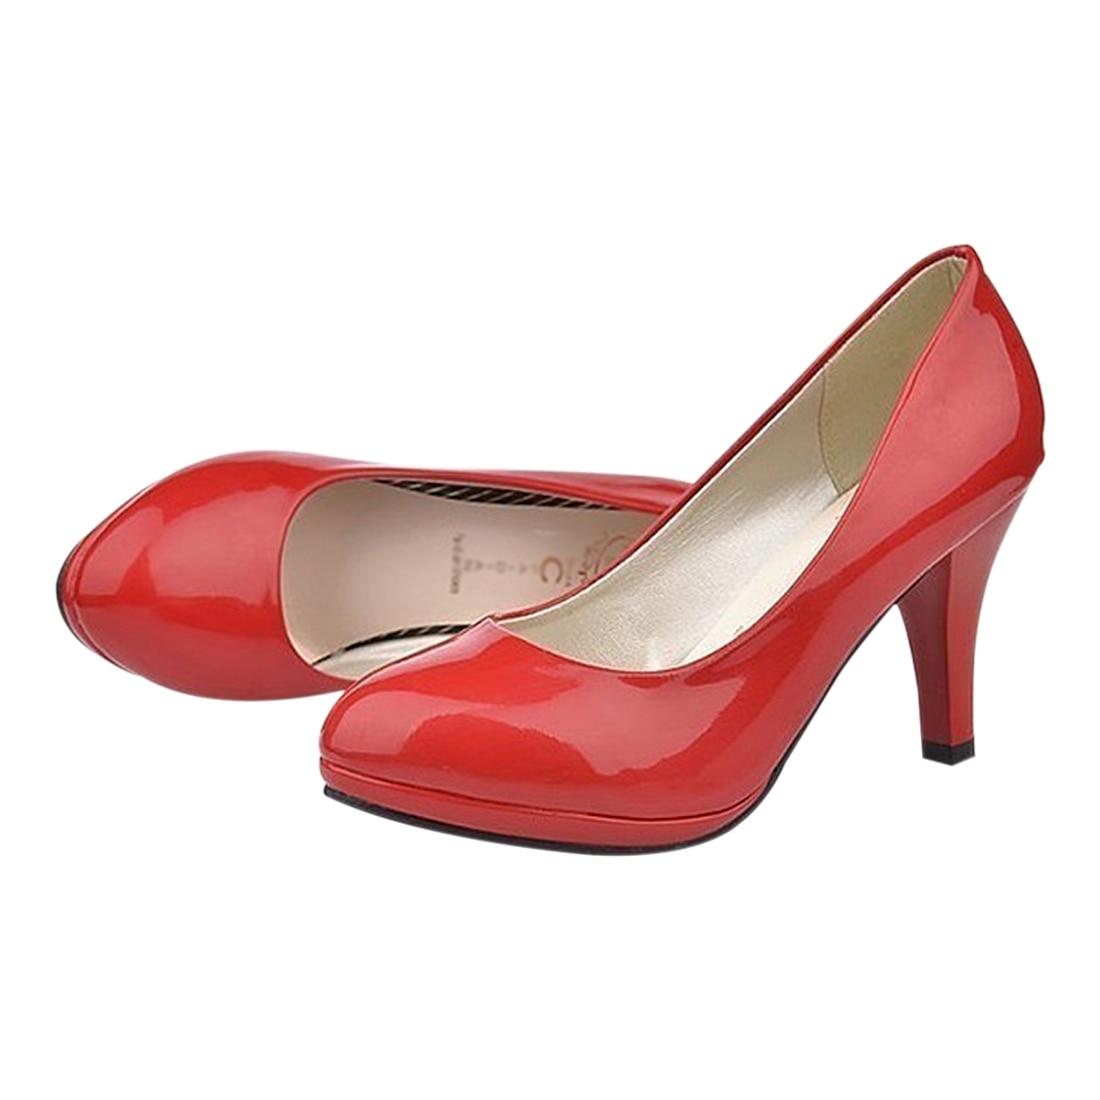 ABDB Classic Sexy Office Lady Round Toe Platform Low Heels Women Wedding Pumps Shoes